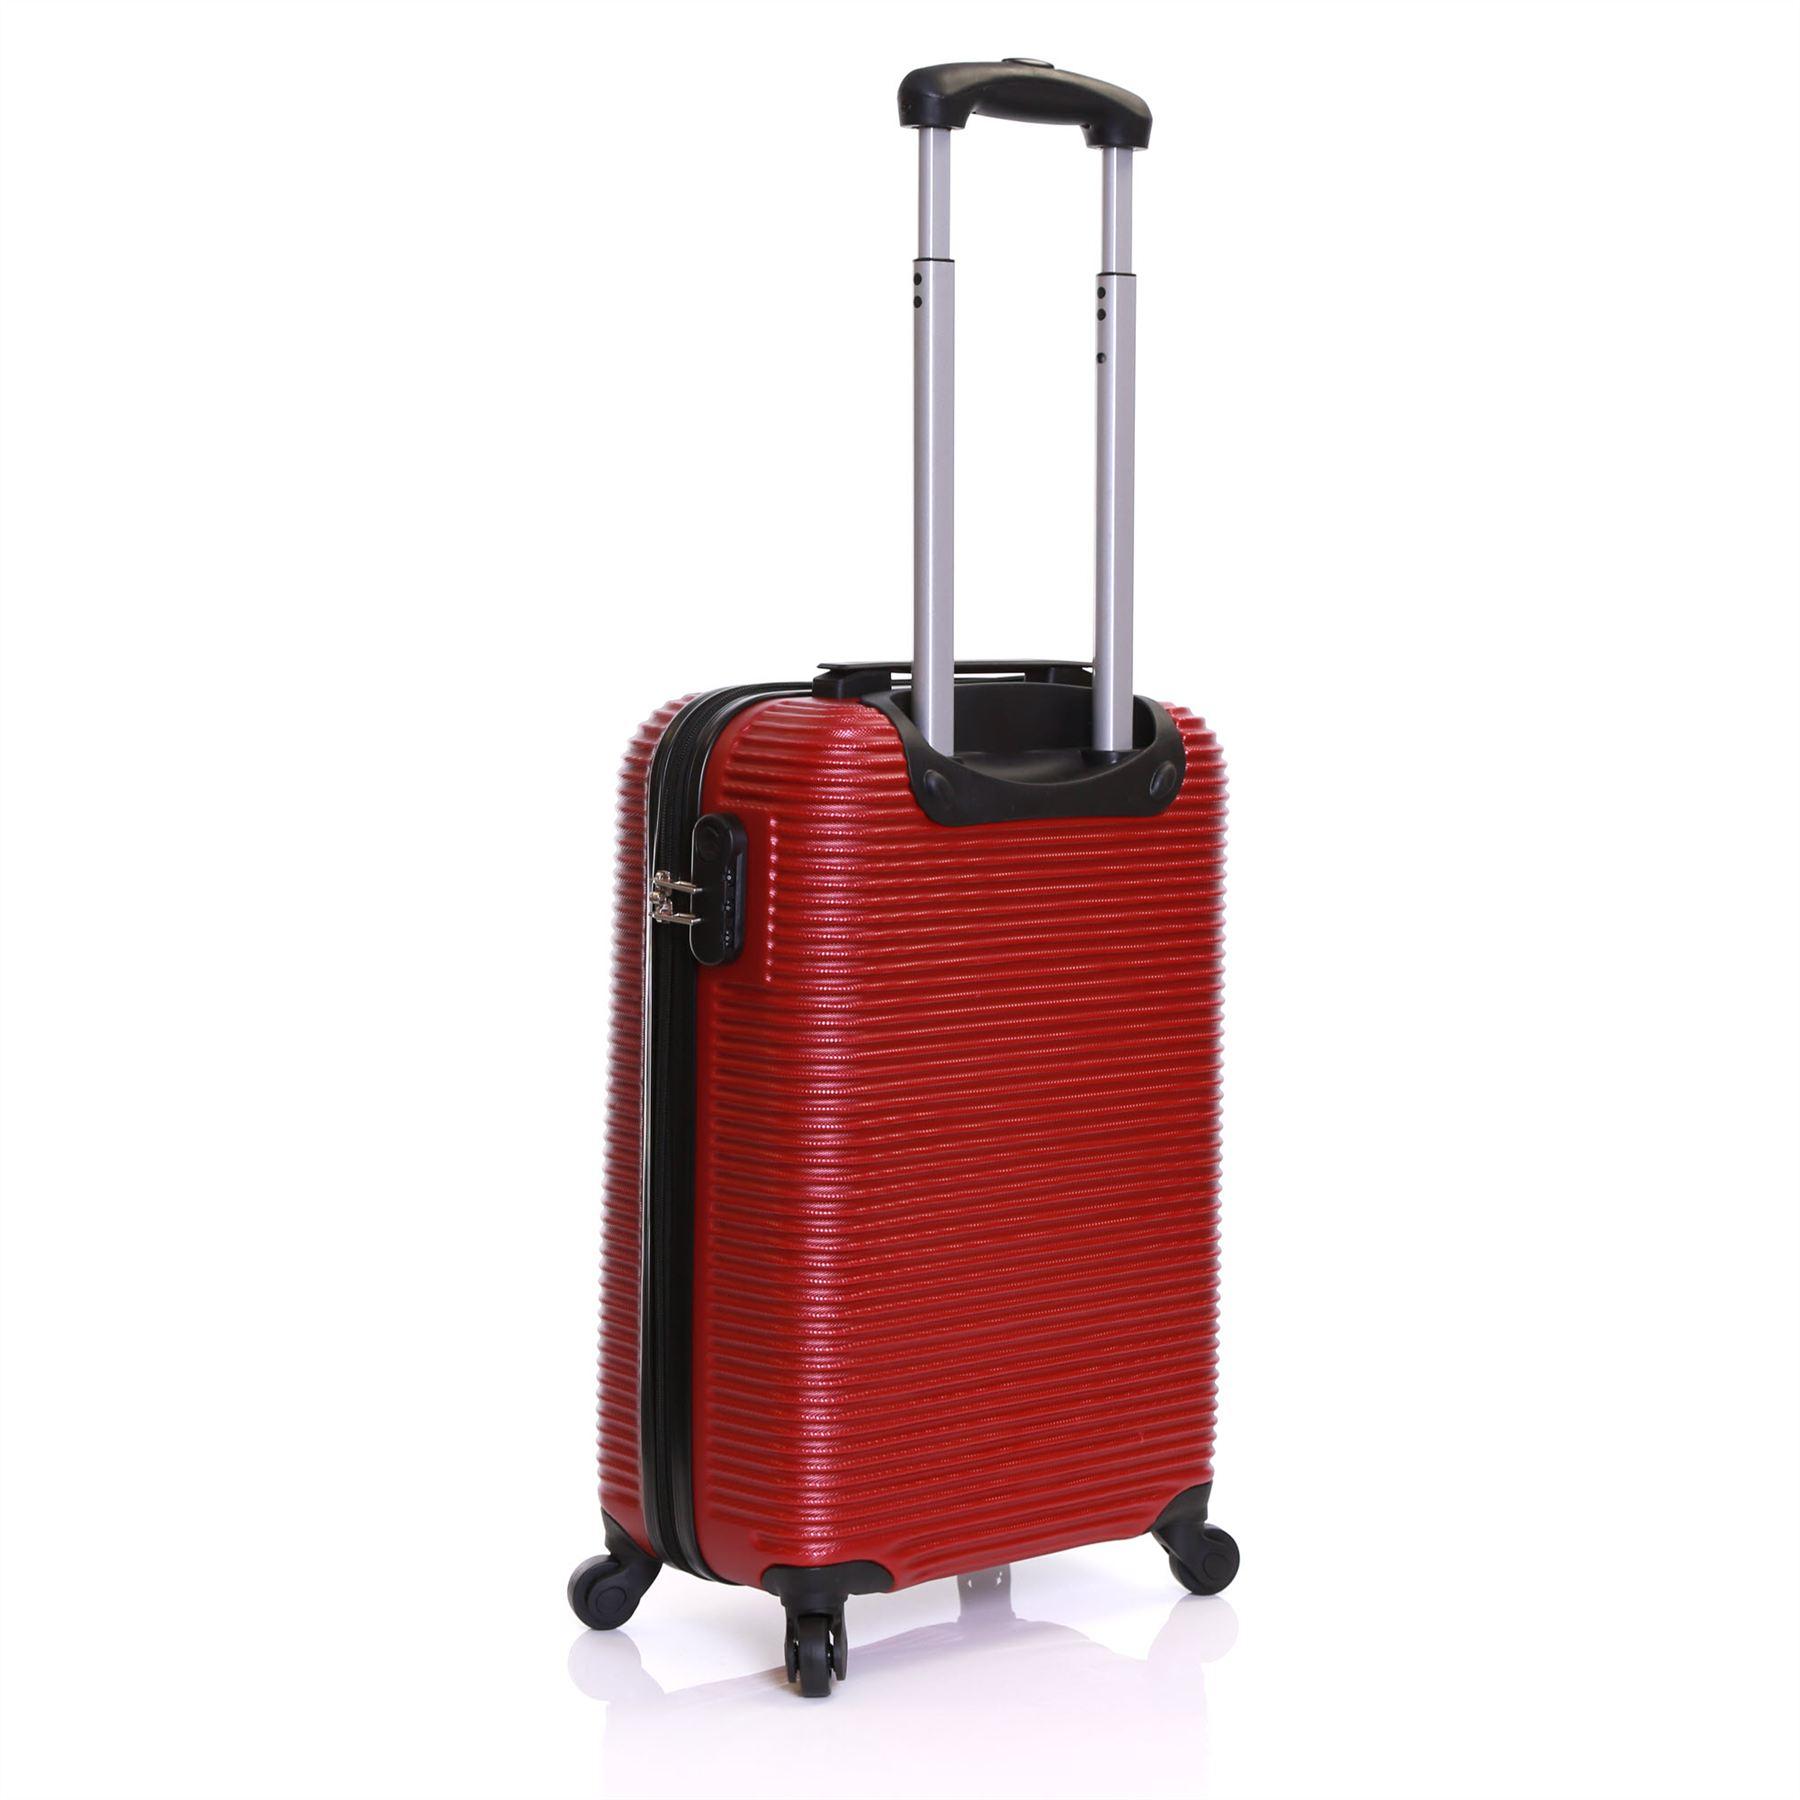 hartplastik kabinengep ck gep ck koffer trolley tasche. Black Bedroom Furniture Sets. Home Design Ideas